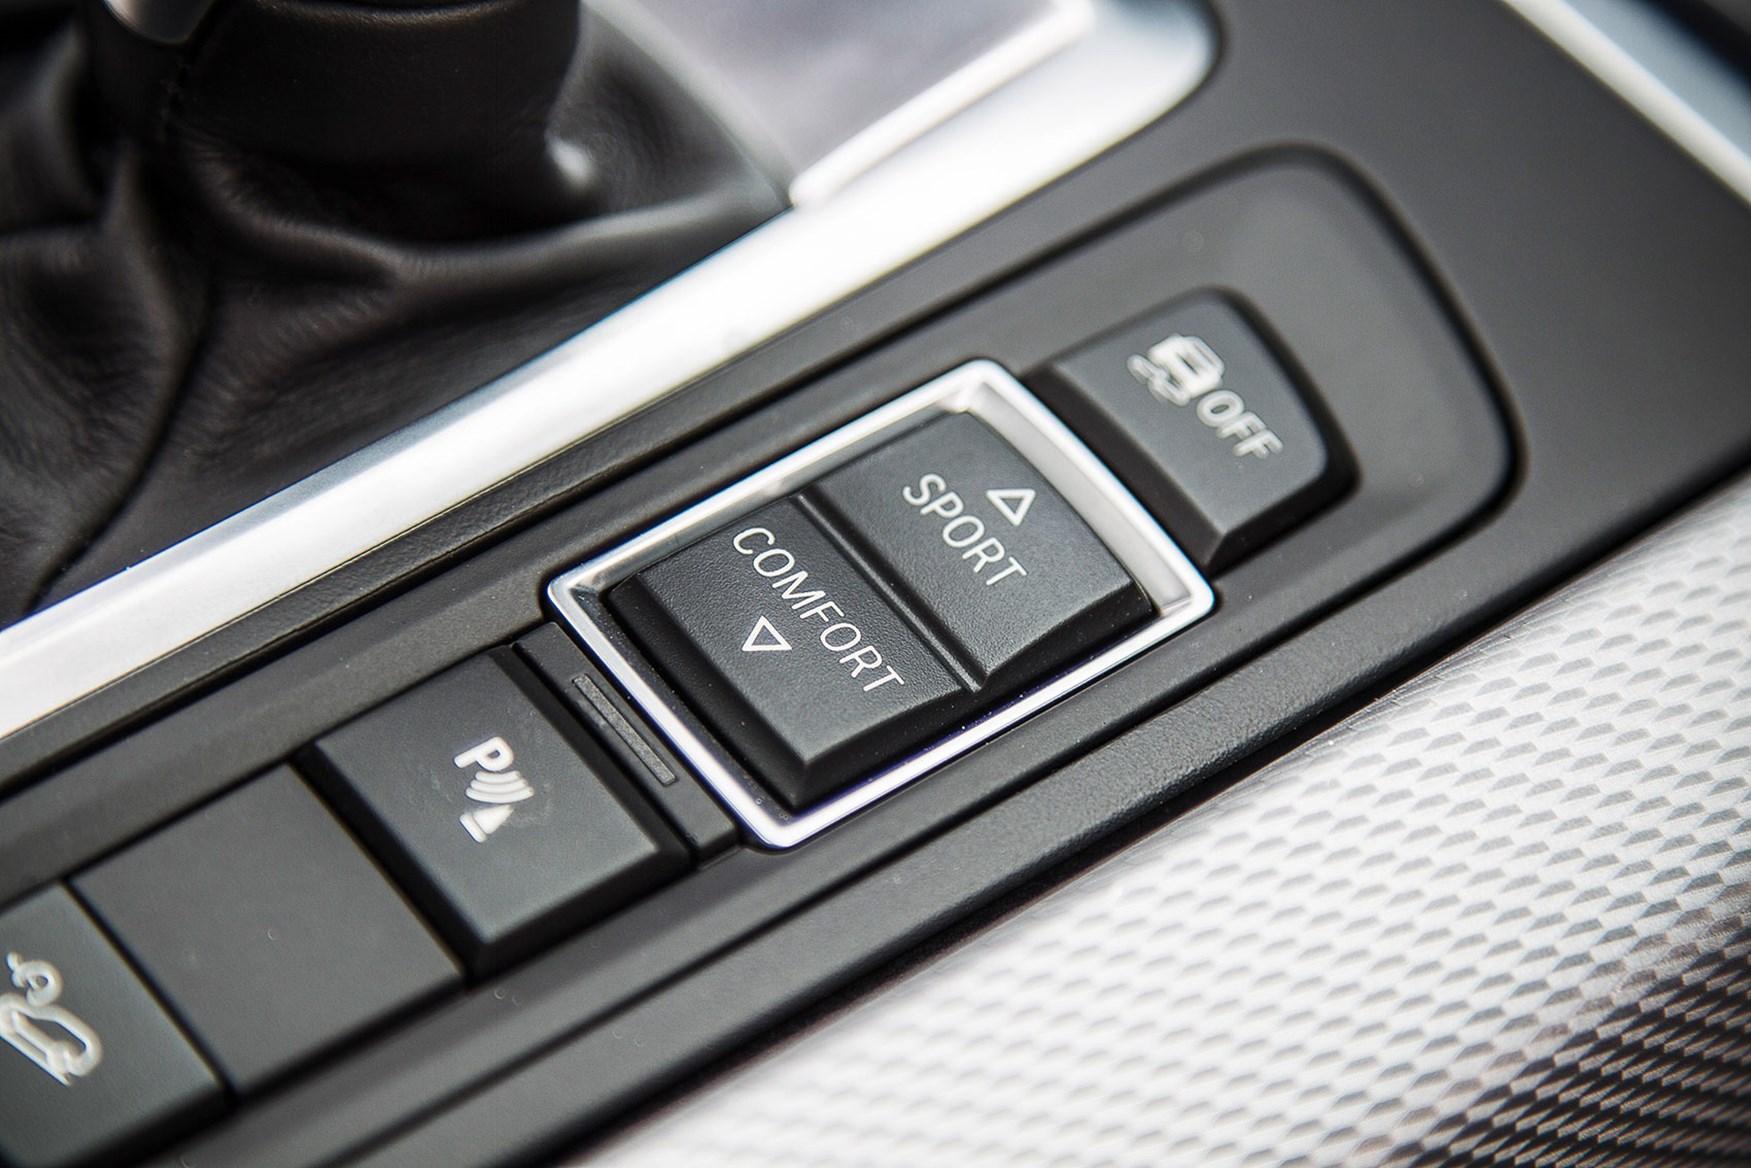 Volvo Xc90 Vs Bmw X5 Vs Range Rover Sport Triple Test